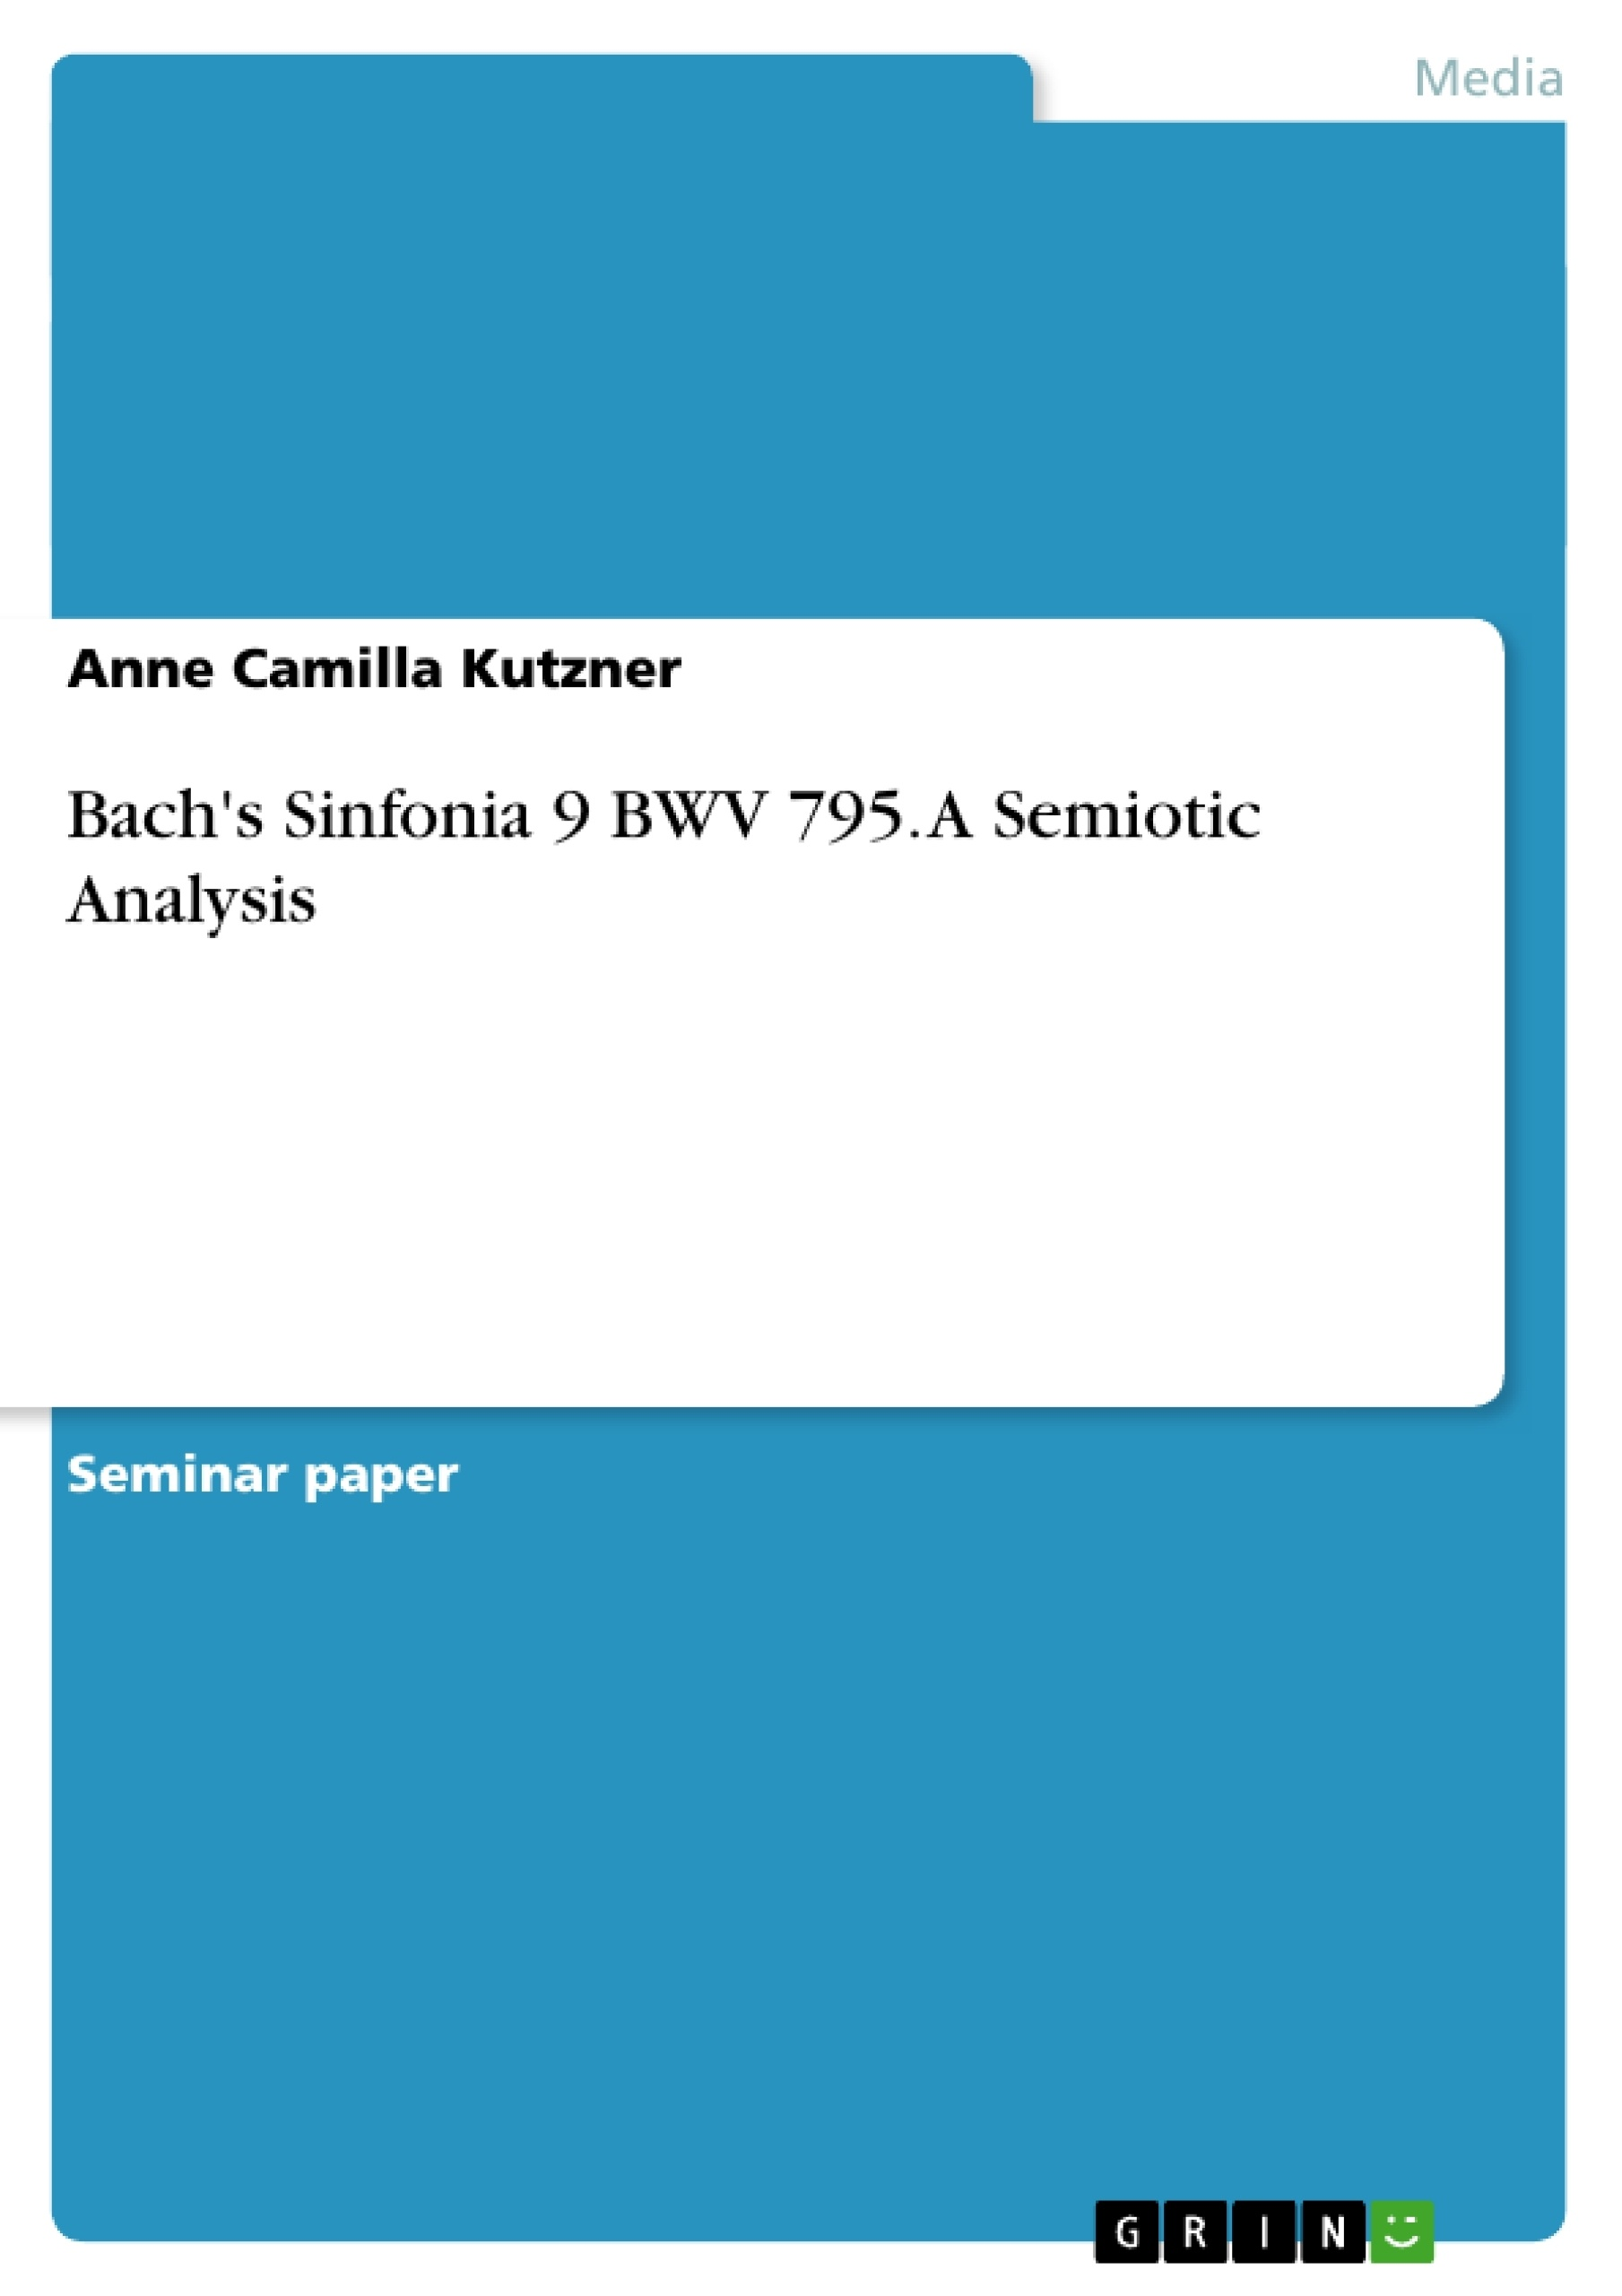 thesis on semiotic analysis